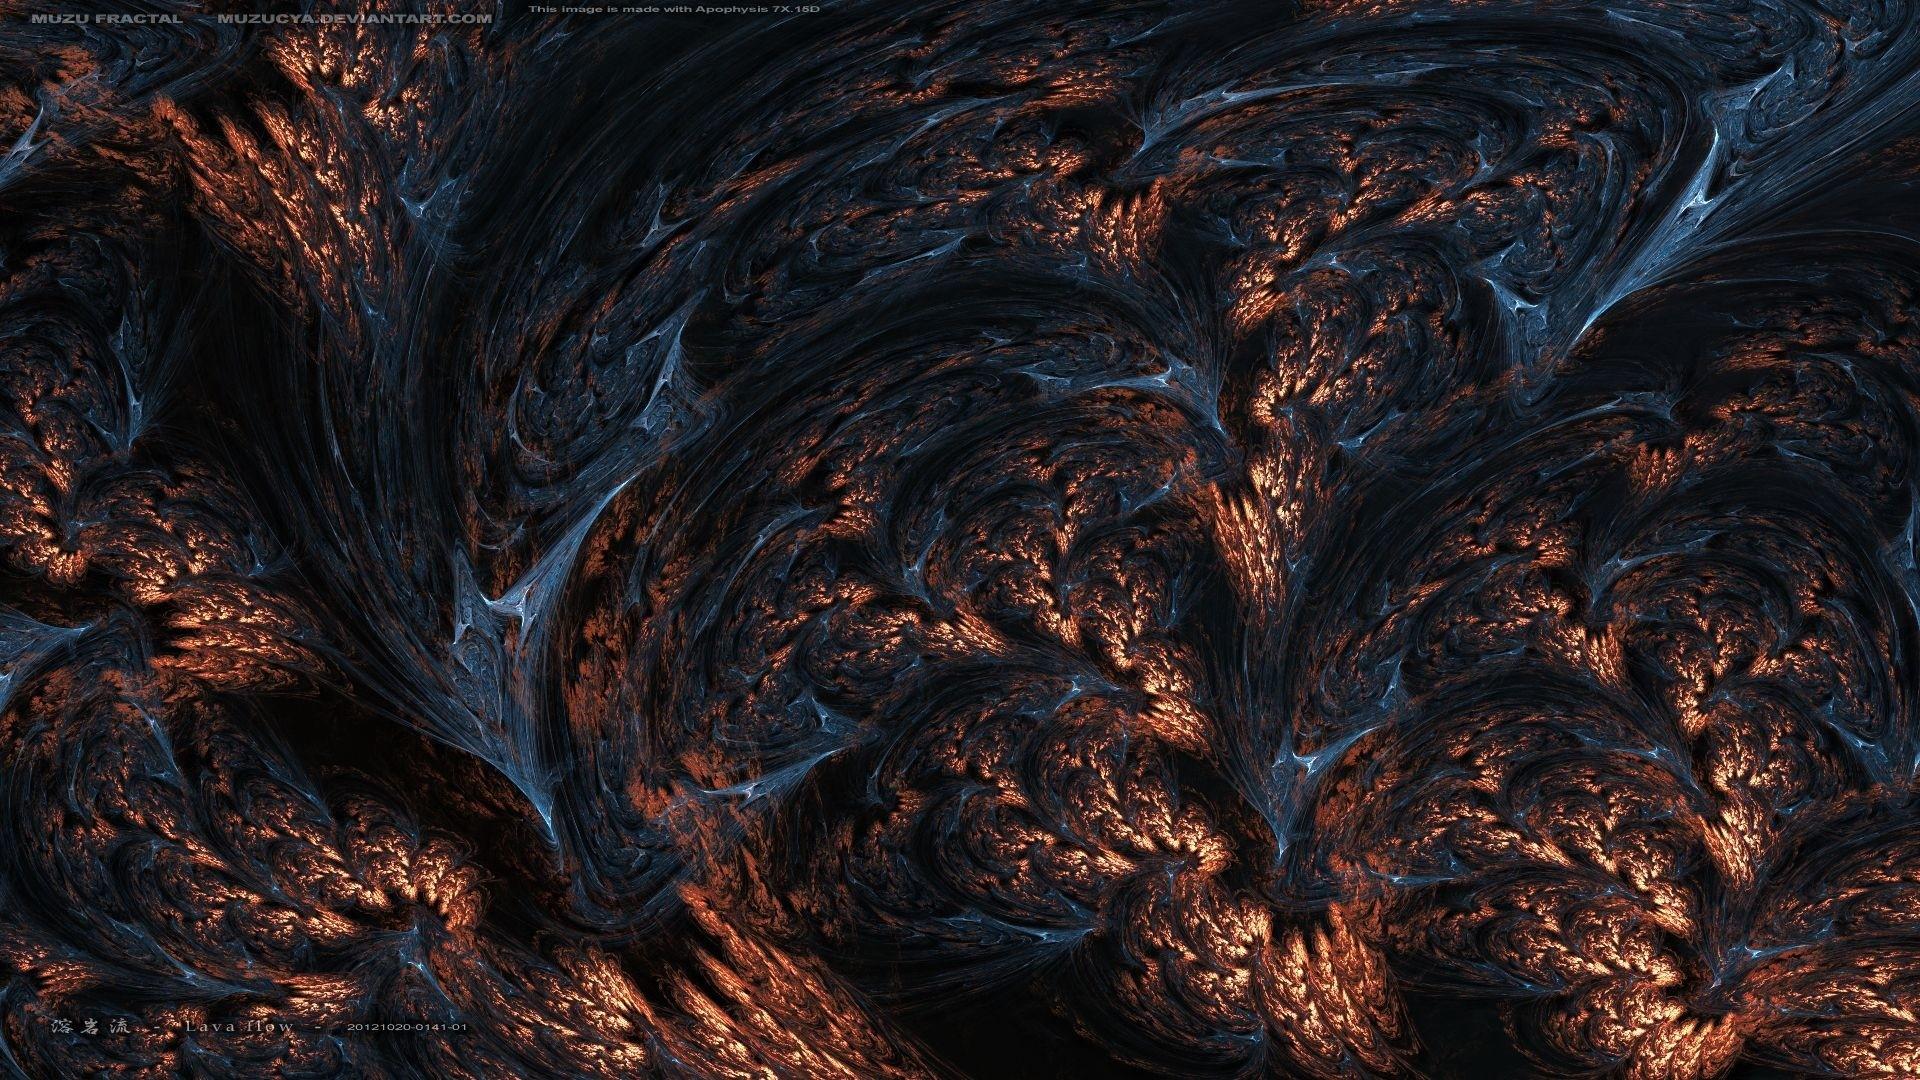 … Background Full HD 1080p. Wallpaper fractals, rocks, lava